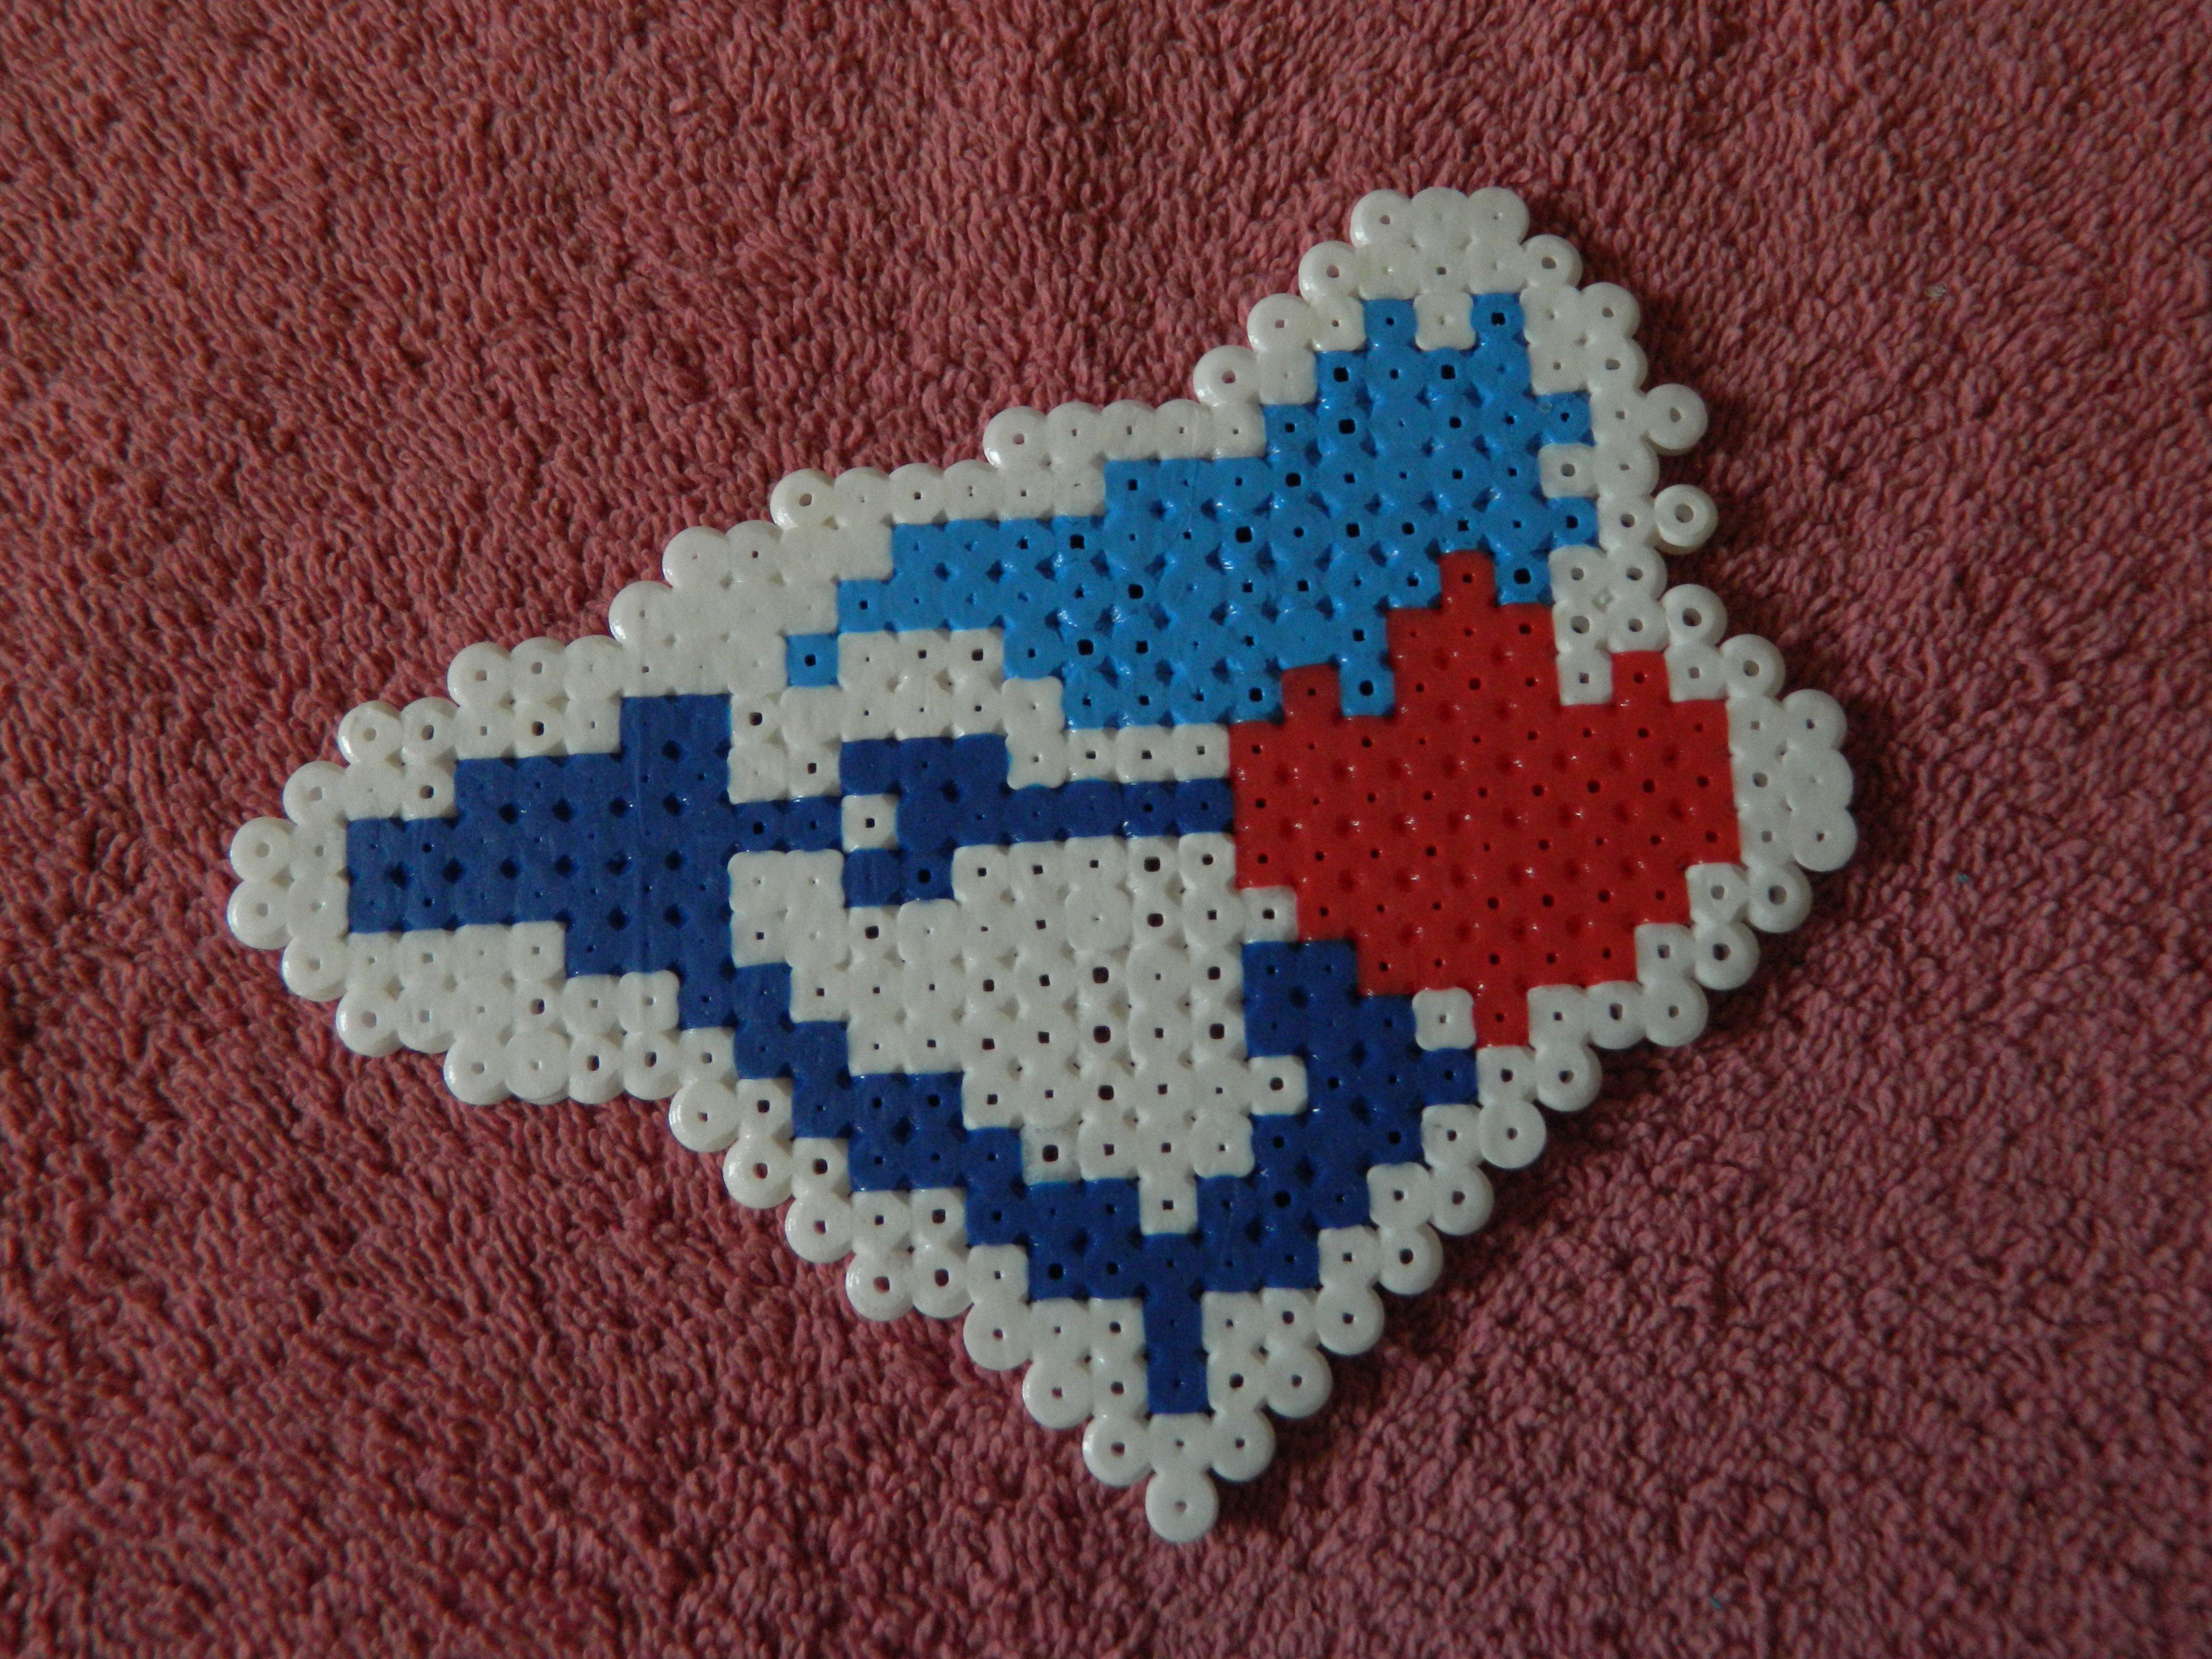 Toronto blue jays christmas ornament - To Stitch Onto A Round Knit Ornament Toronto Blue Jays Logo Perler Beads